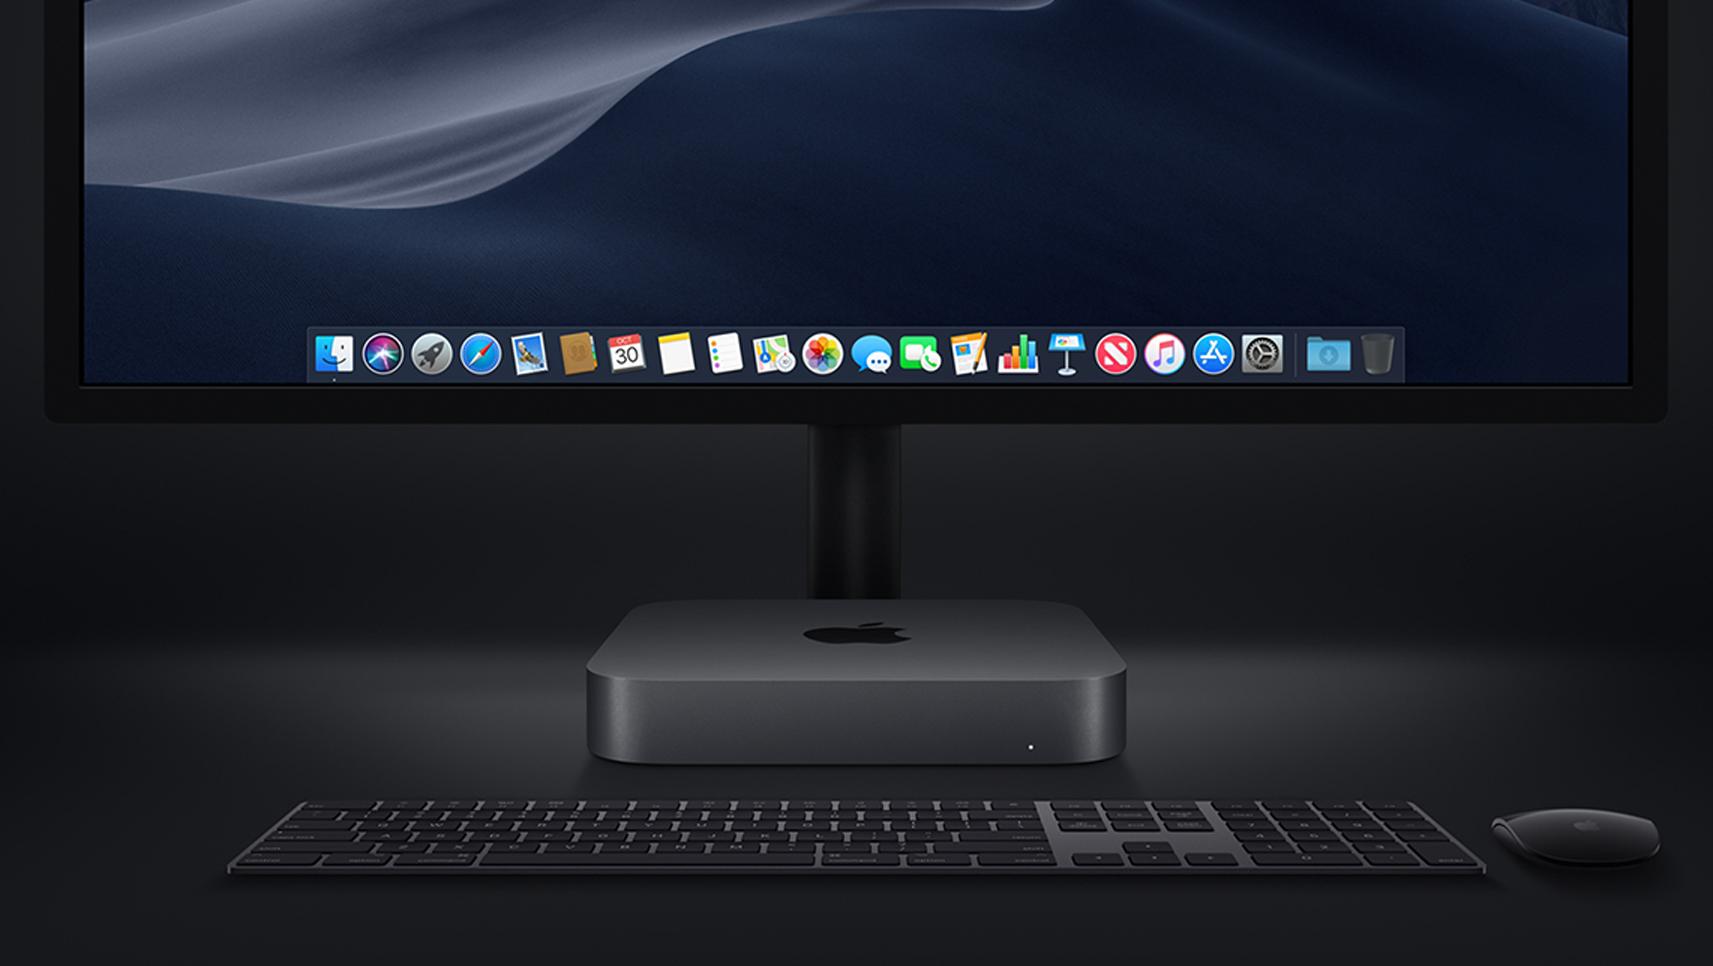 Mac-mini-desktop-setup-display.jpg